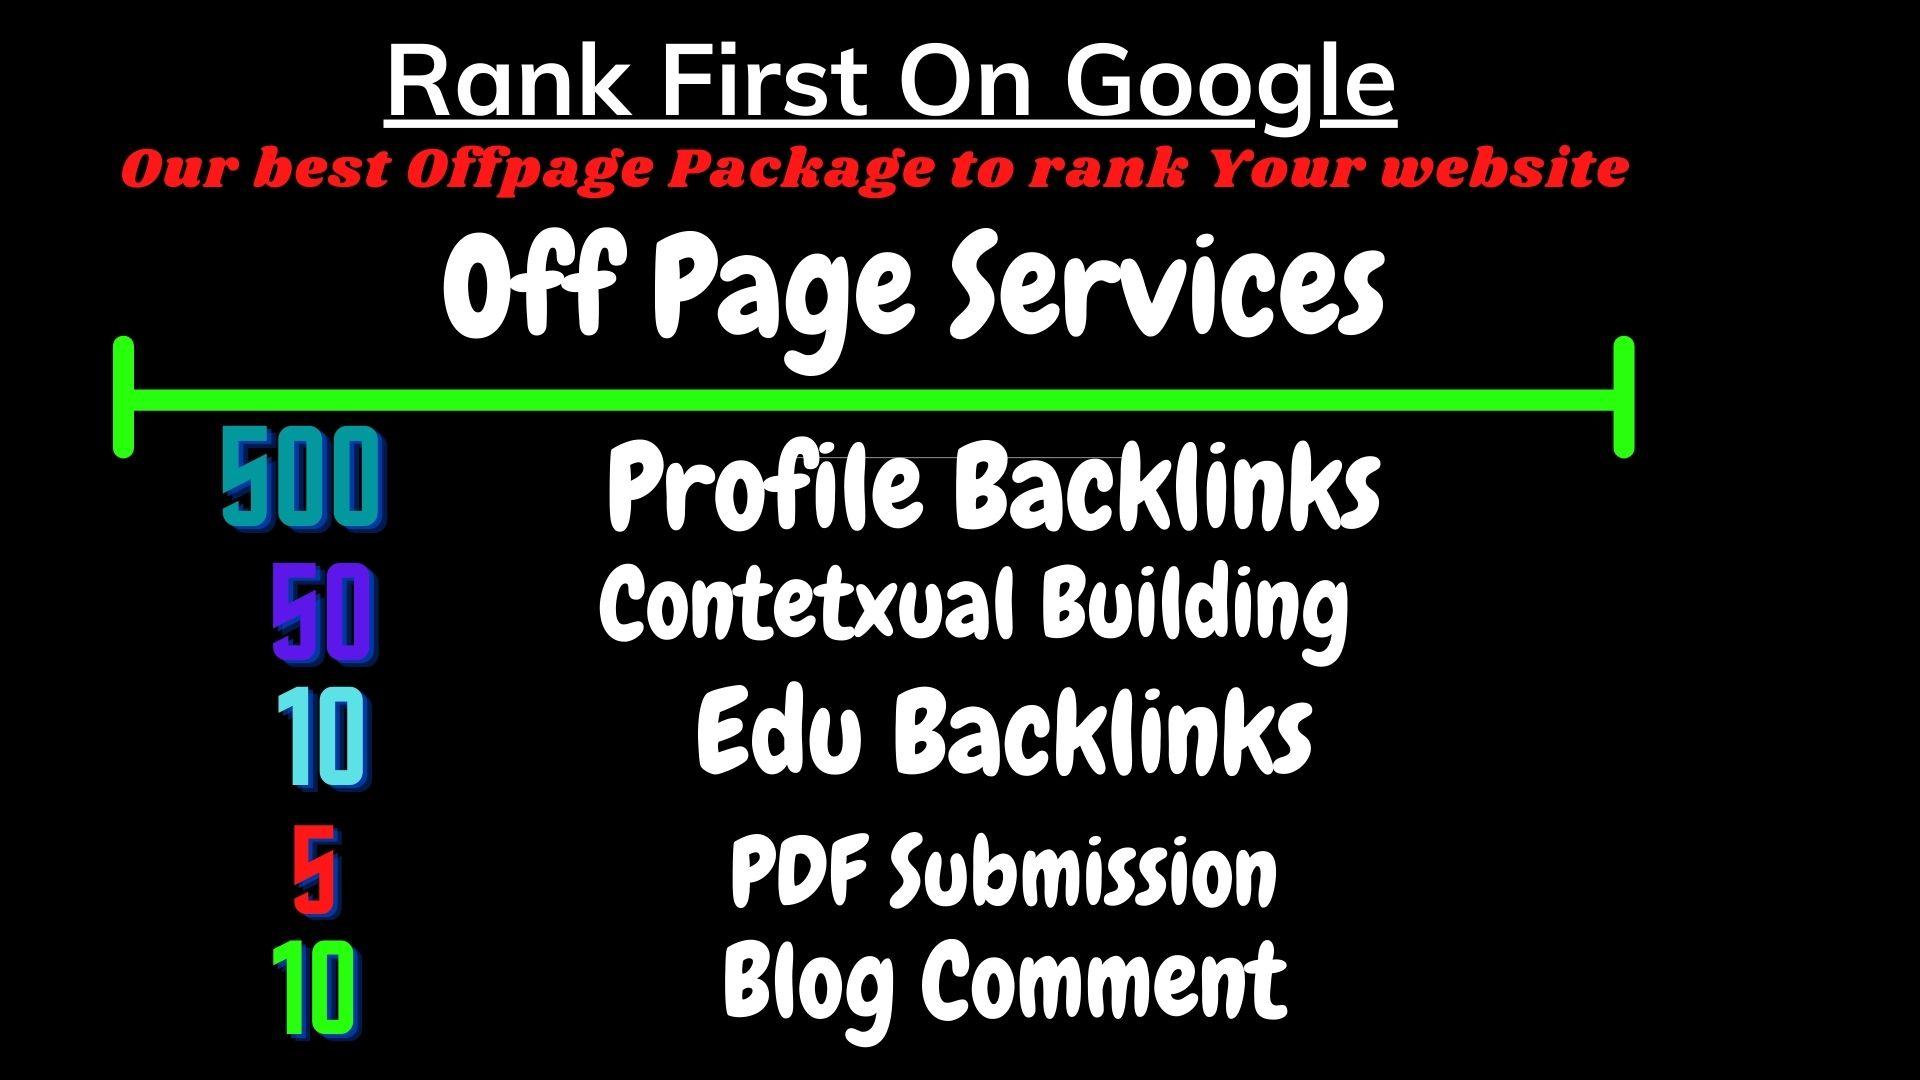 I will provide you 500 profile backlinks,  50 contextual backlinks 10 edu backlinks 10 blog comments